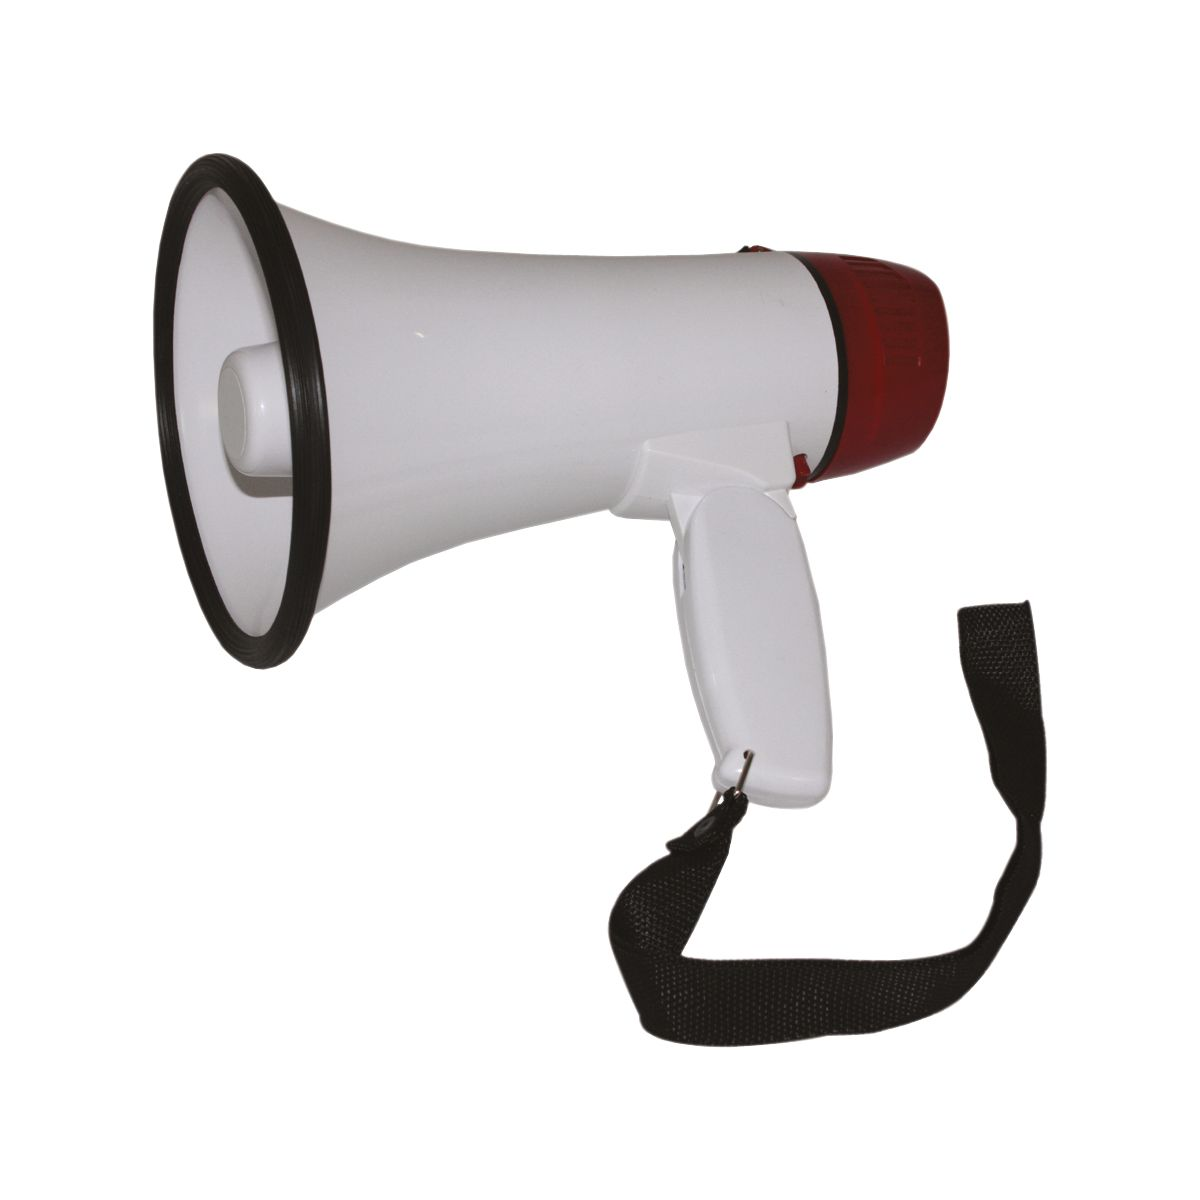 Microphone LTC AUDIO MEGA20W (photo)